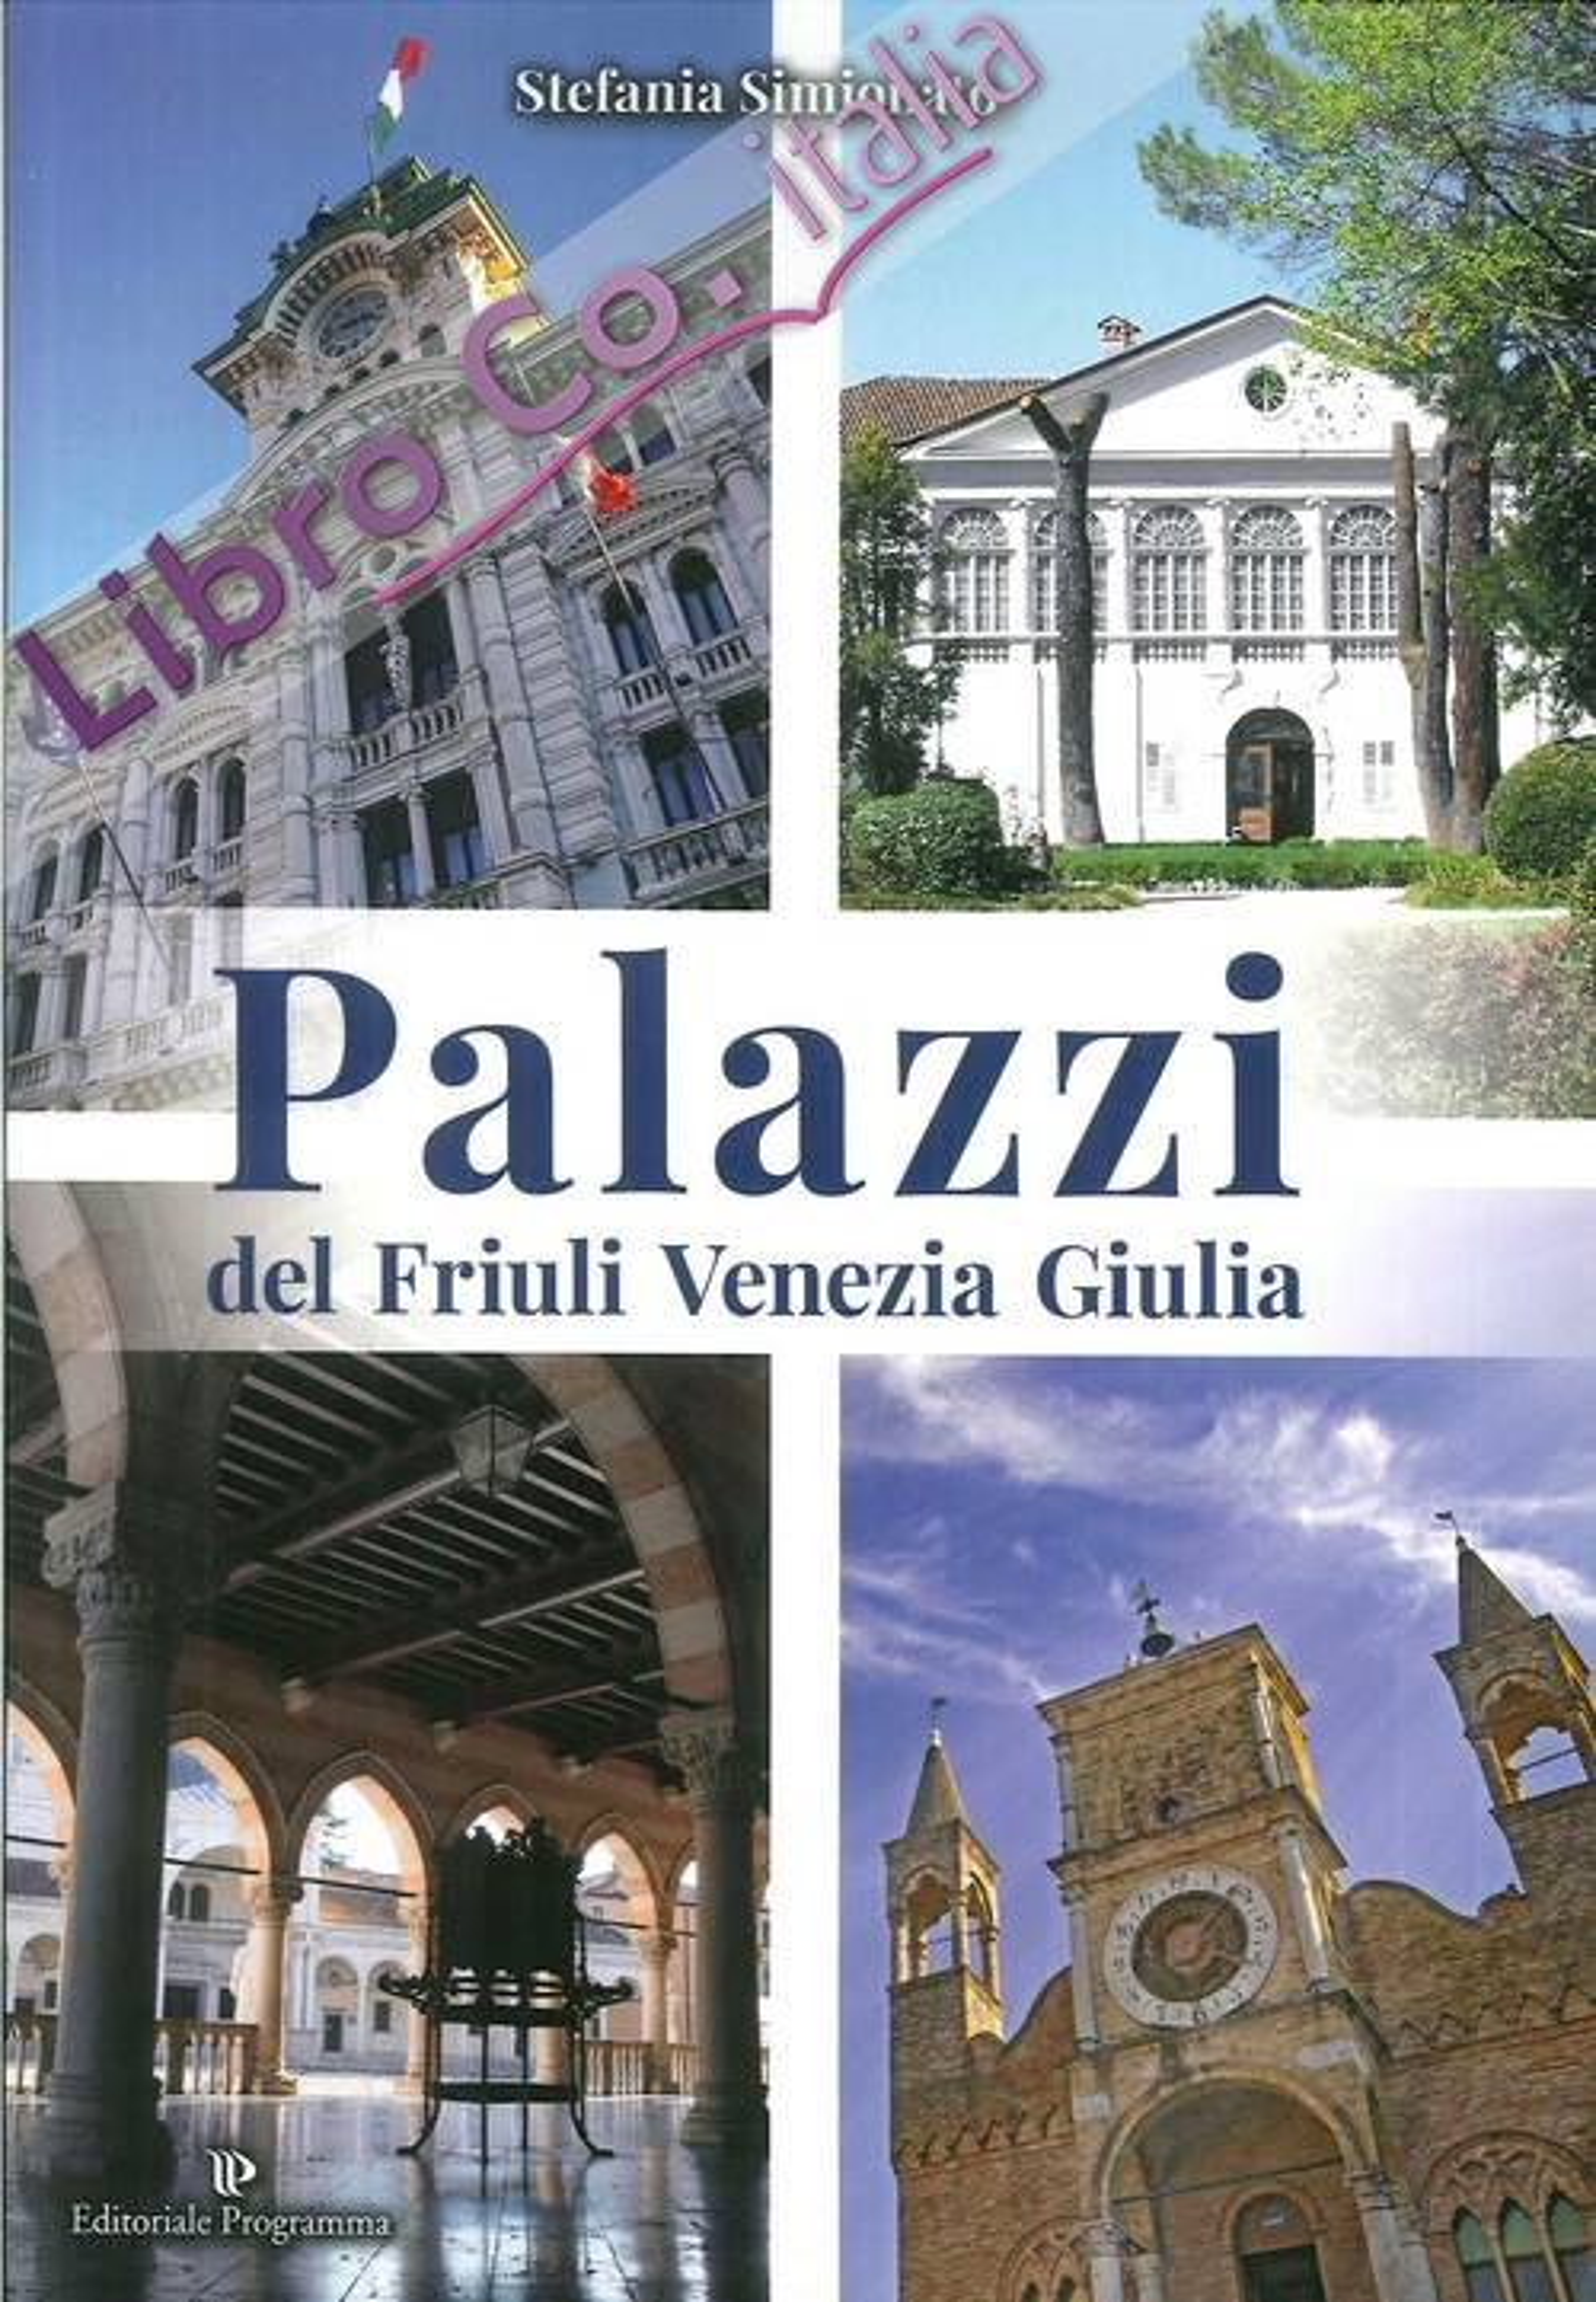 Palazzi del Friuli Venezia Giulia.